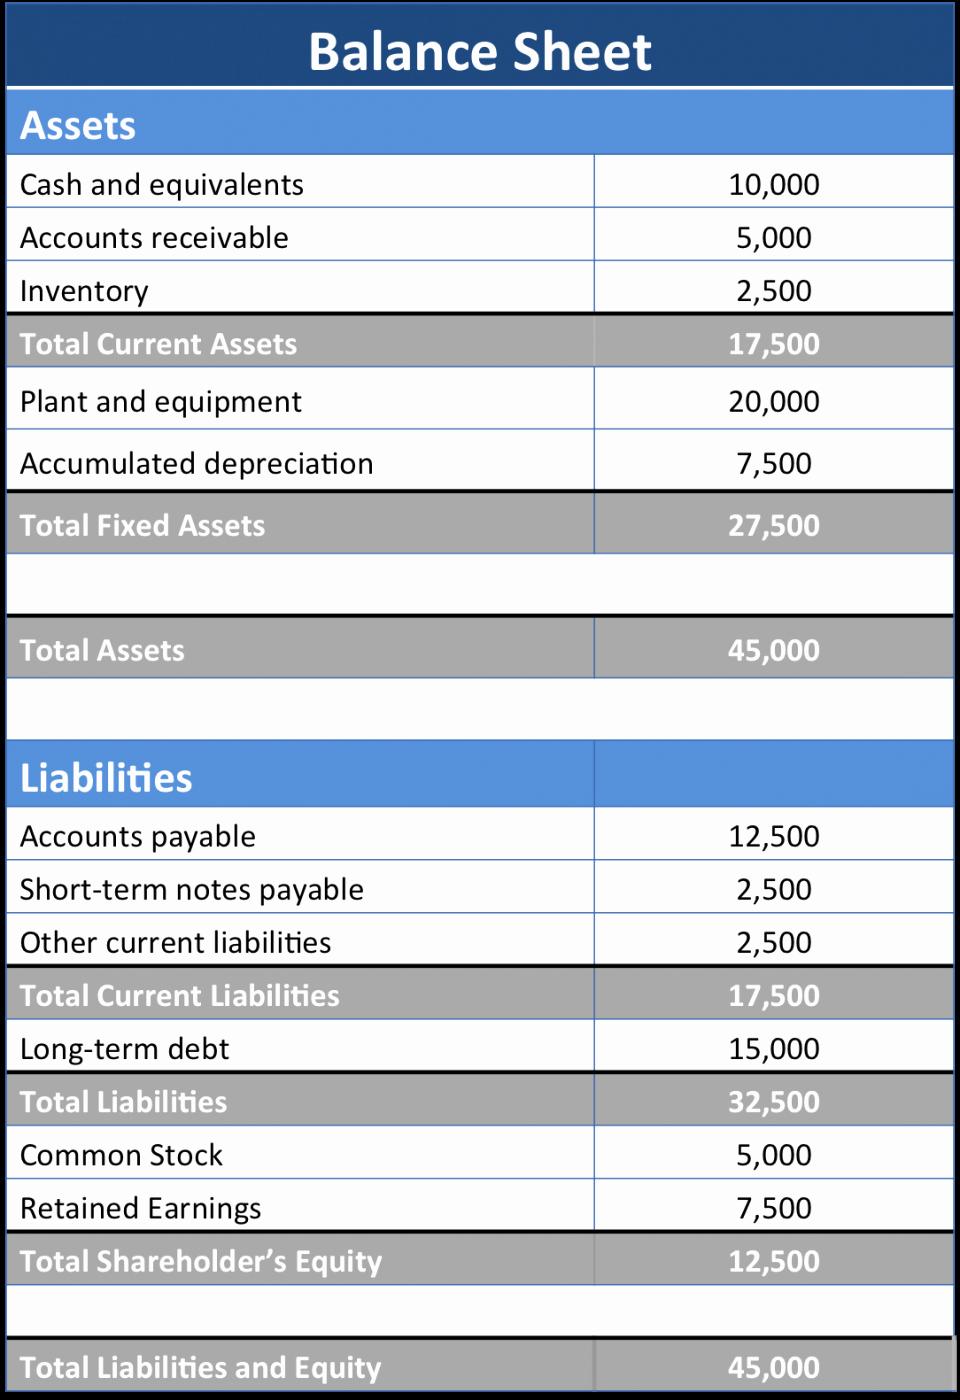 Real Estate Balance Sheet Template New Balance Sheet Template for Real Estate Example form Blank